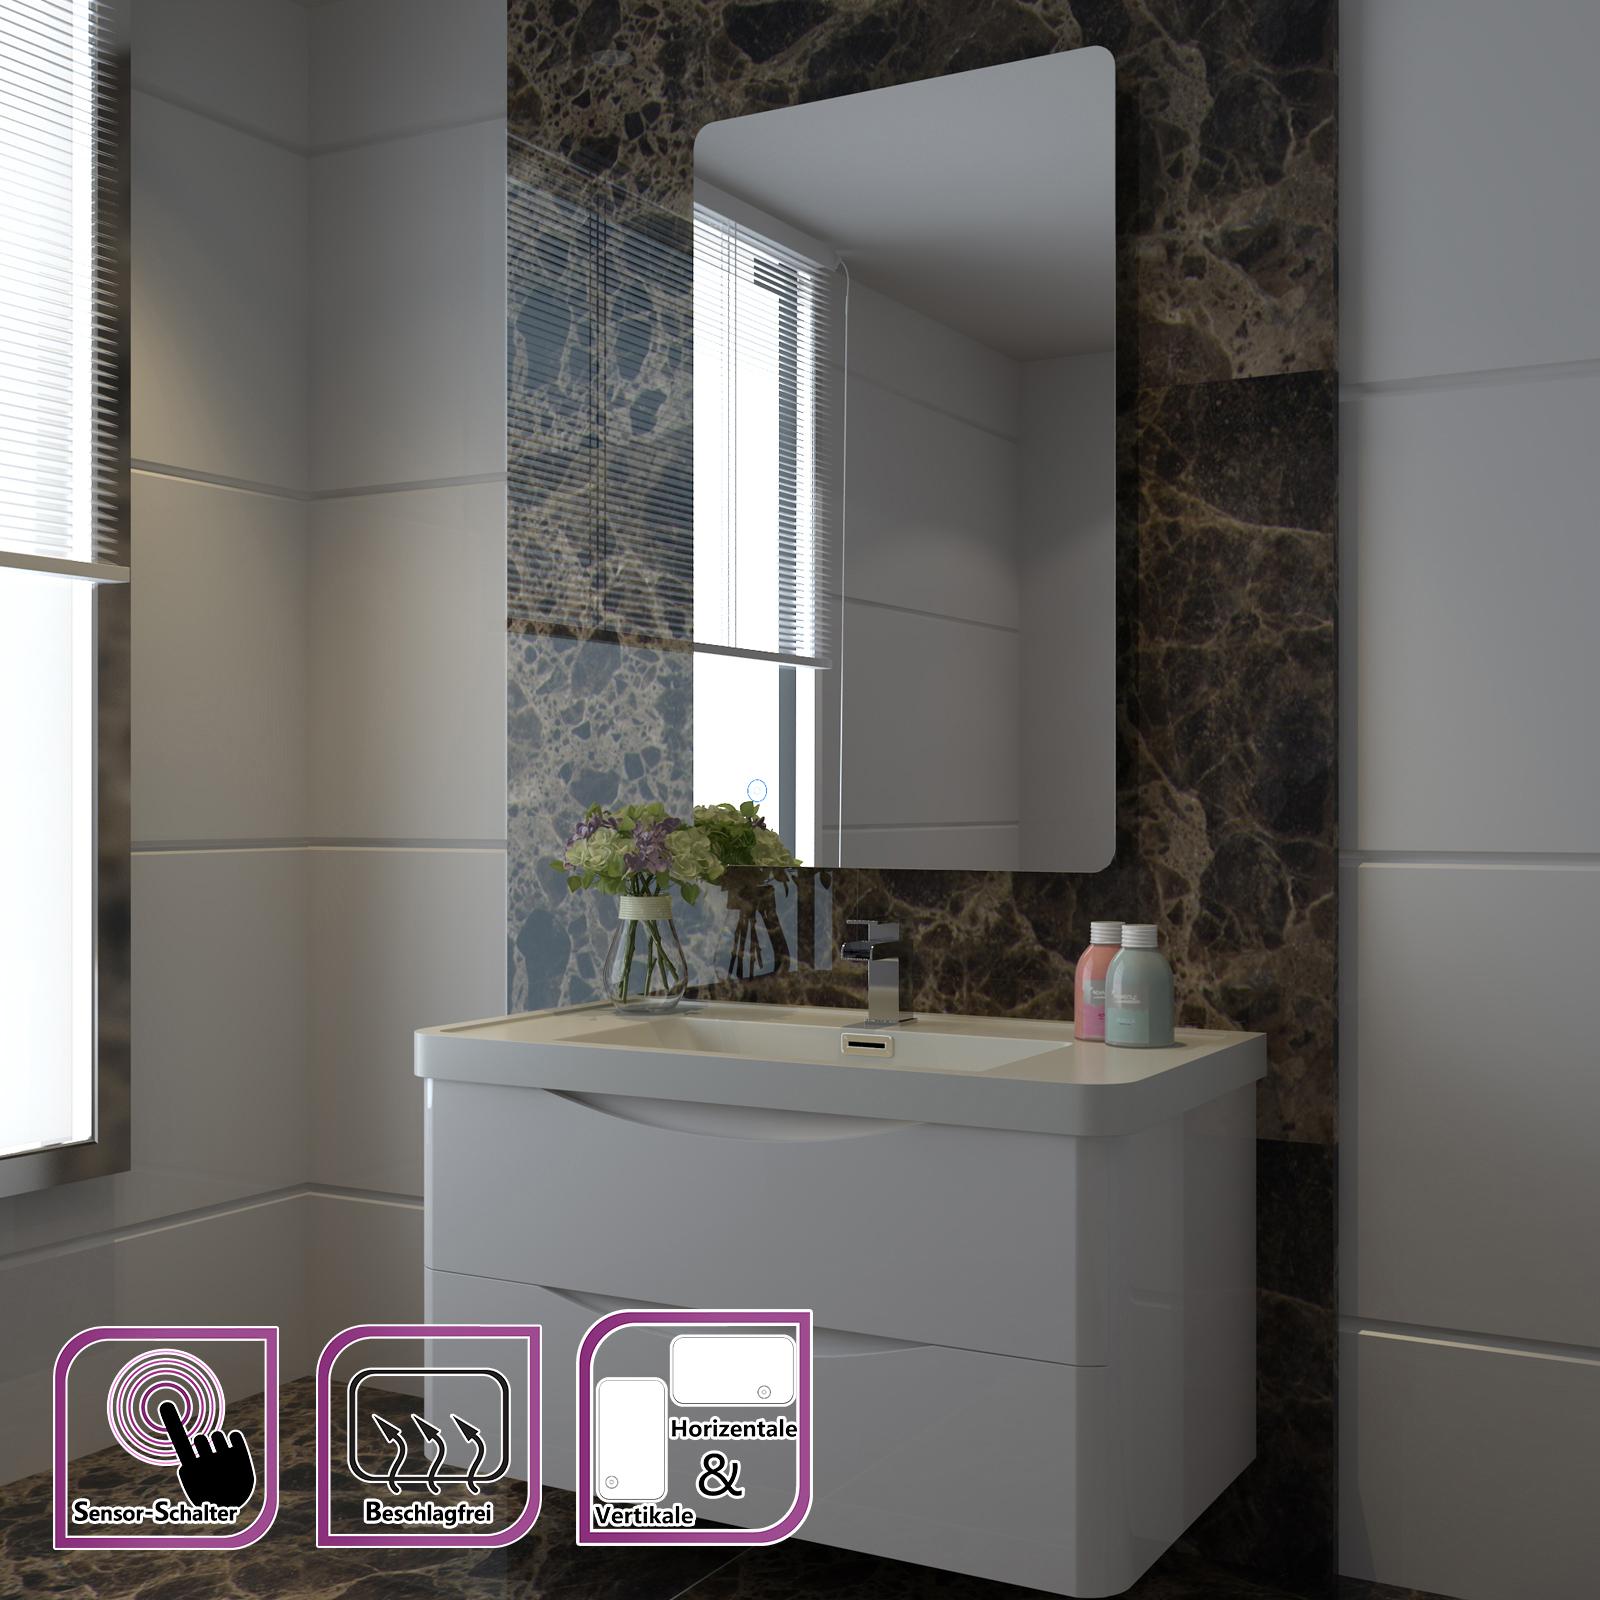 badspiegel badezimmerspiegel led beleuchtung warmwei ip44 sensor touch schalter ebay. Black Bedroom Furniture Sets. Home Design Ideas